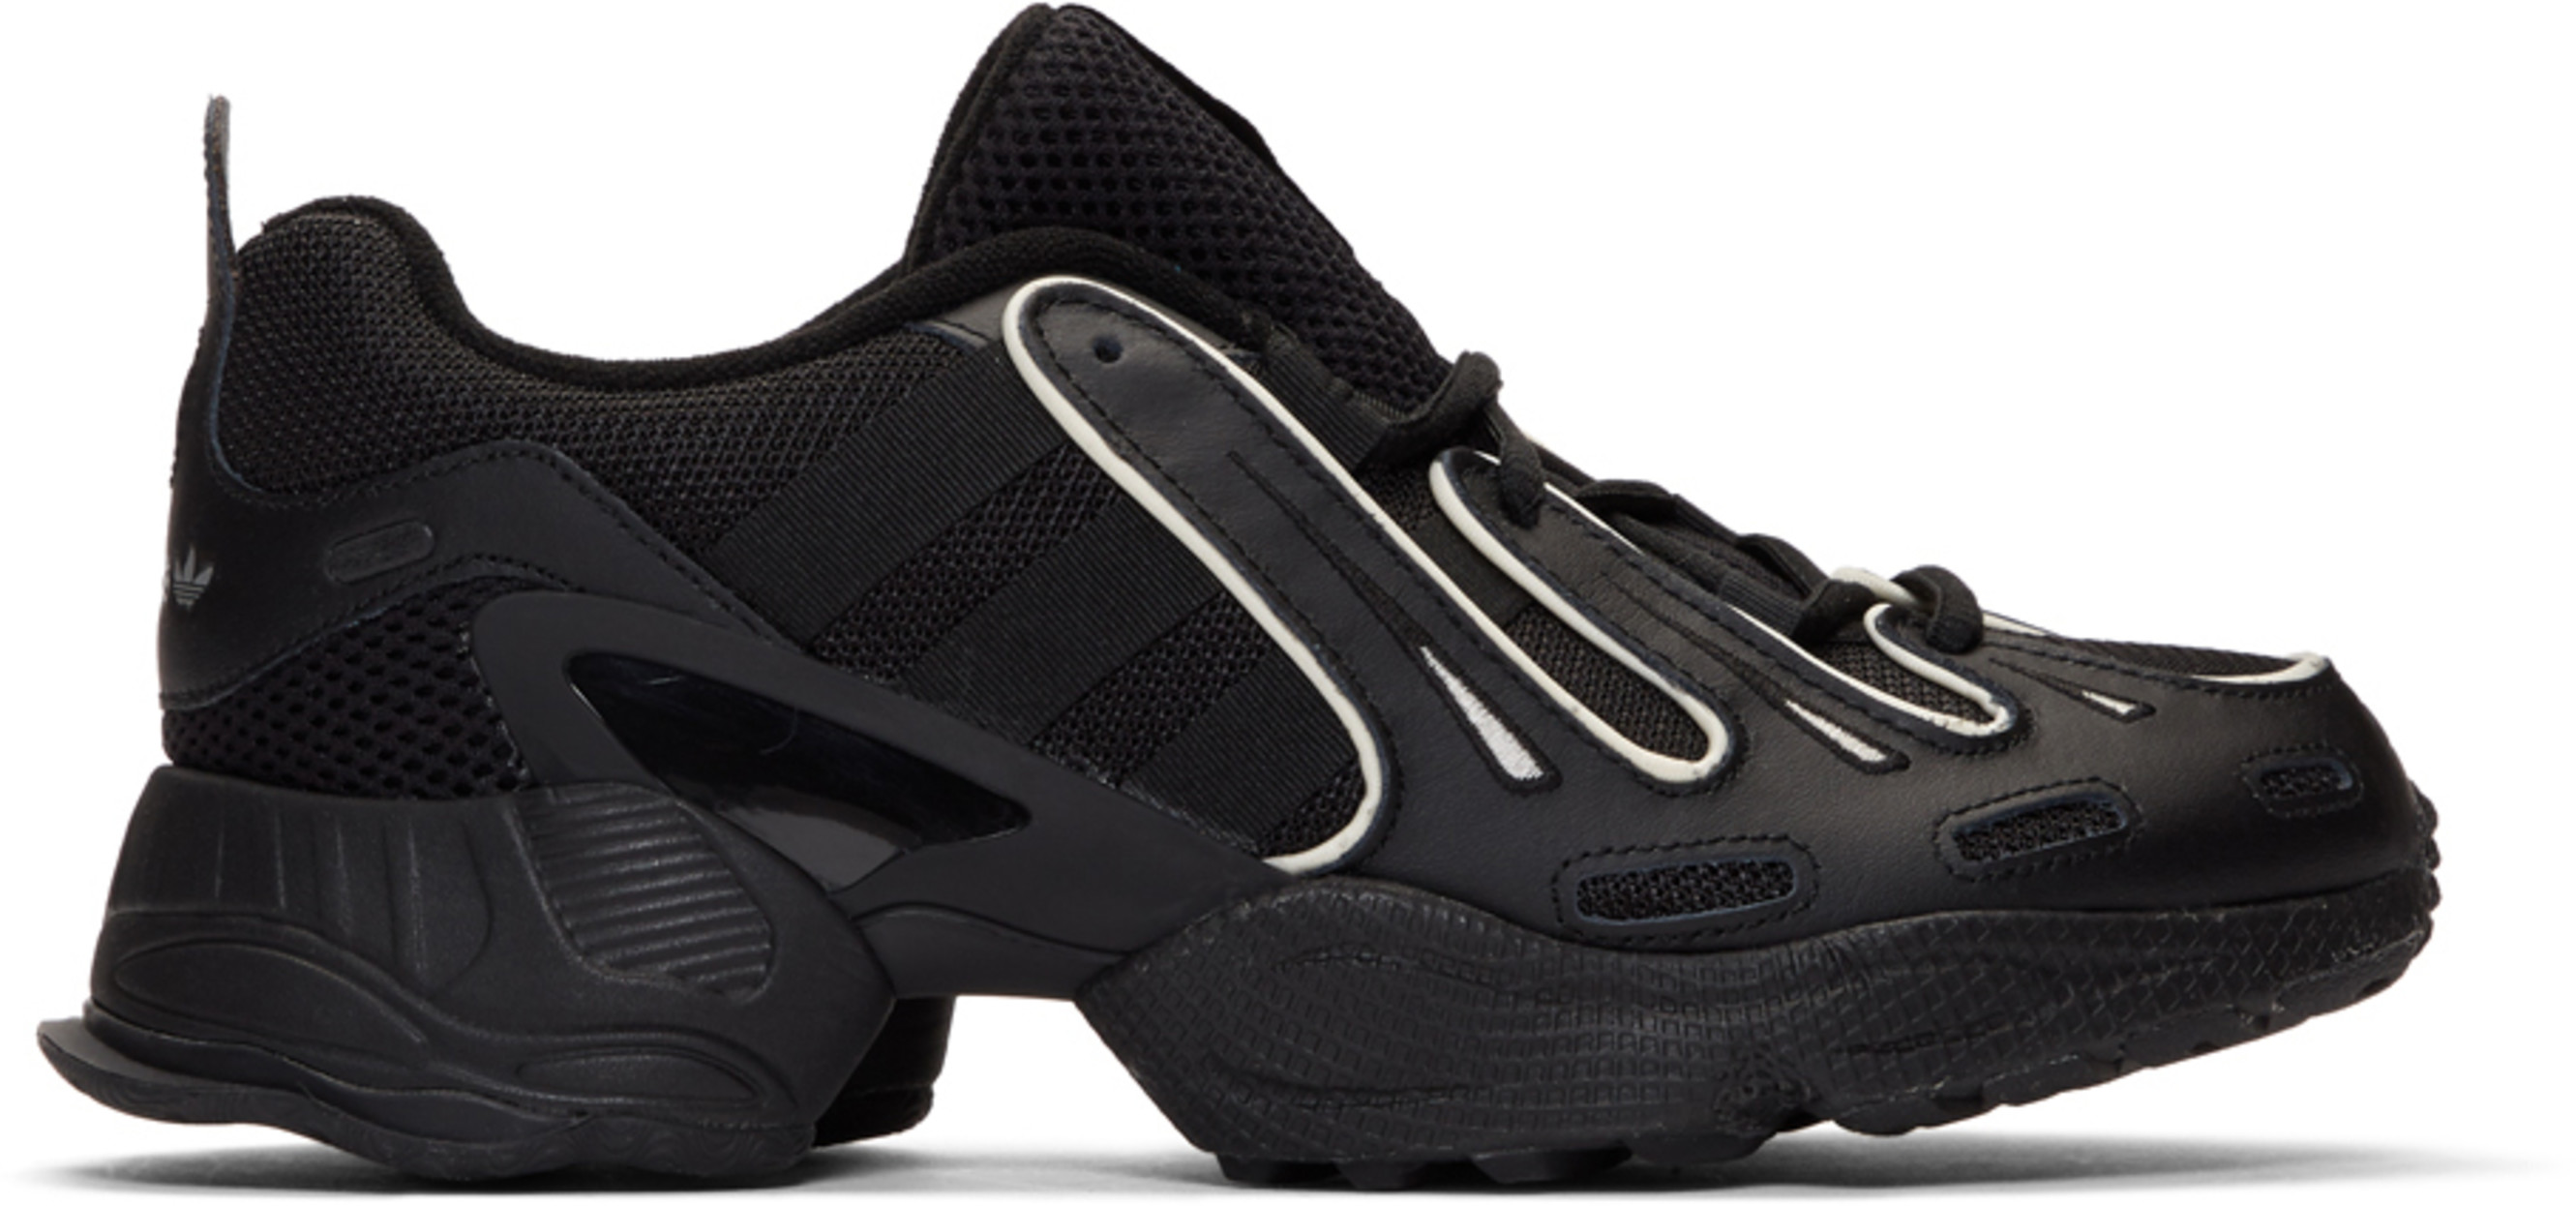 Black E G Sneakers